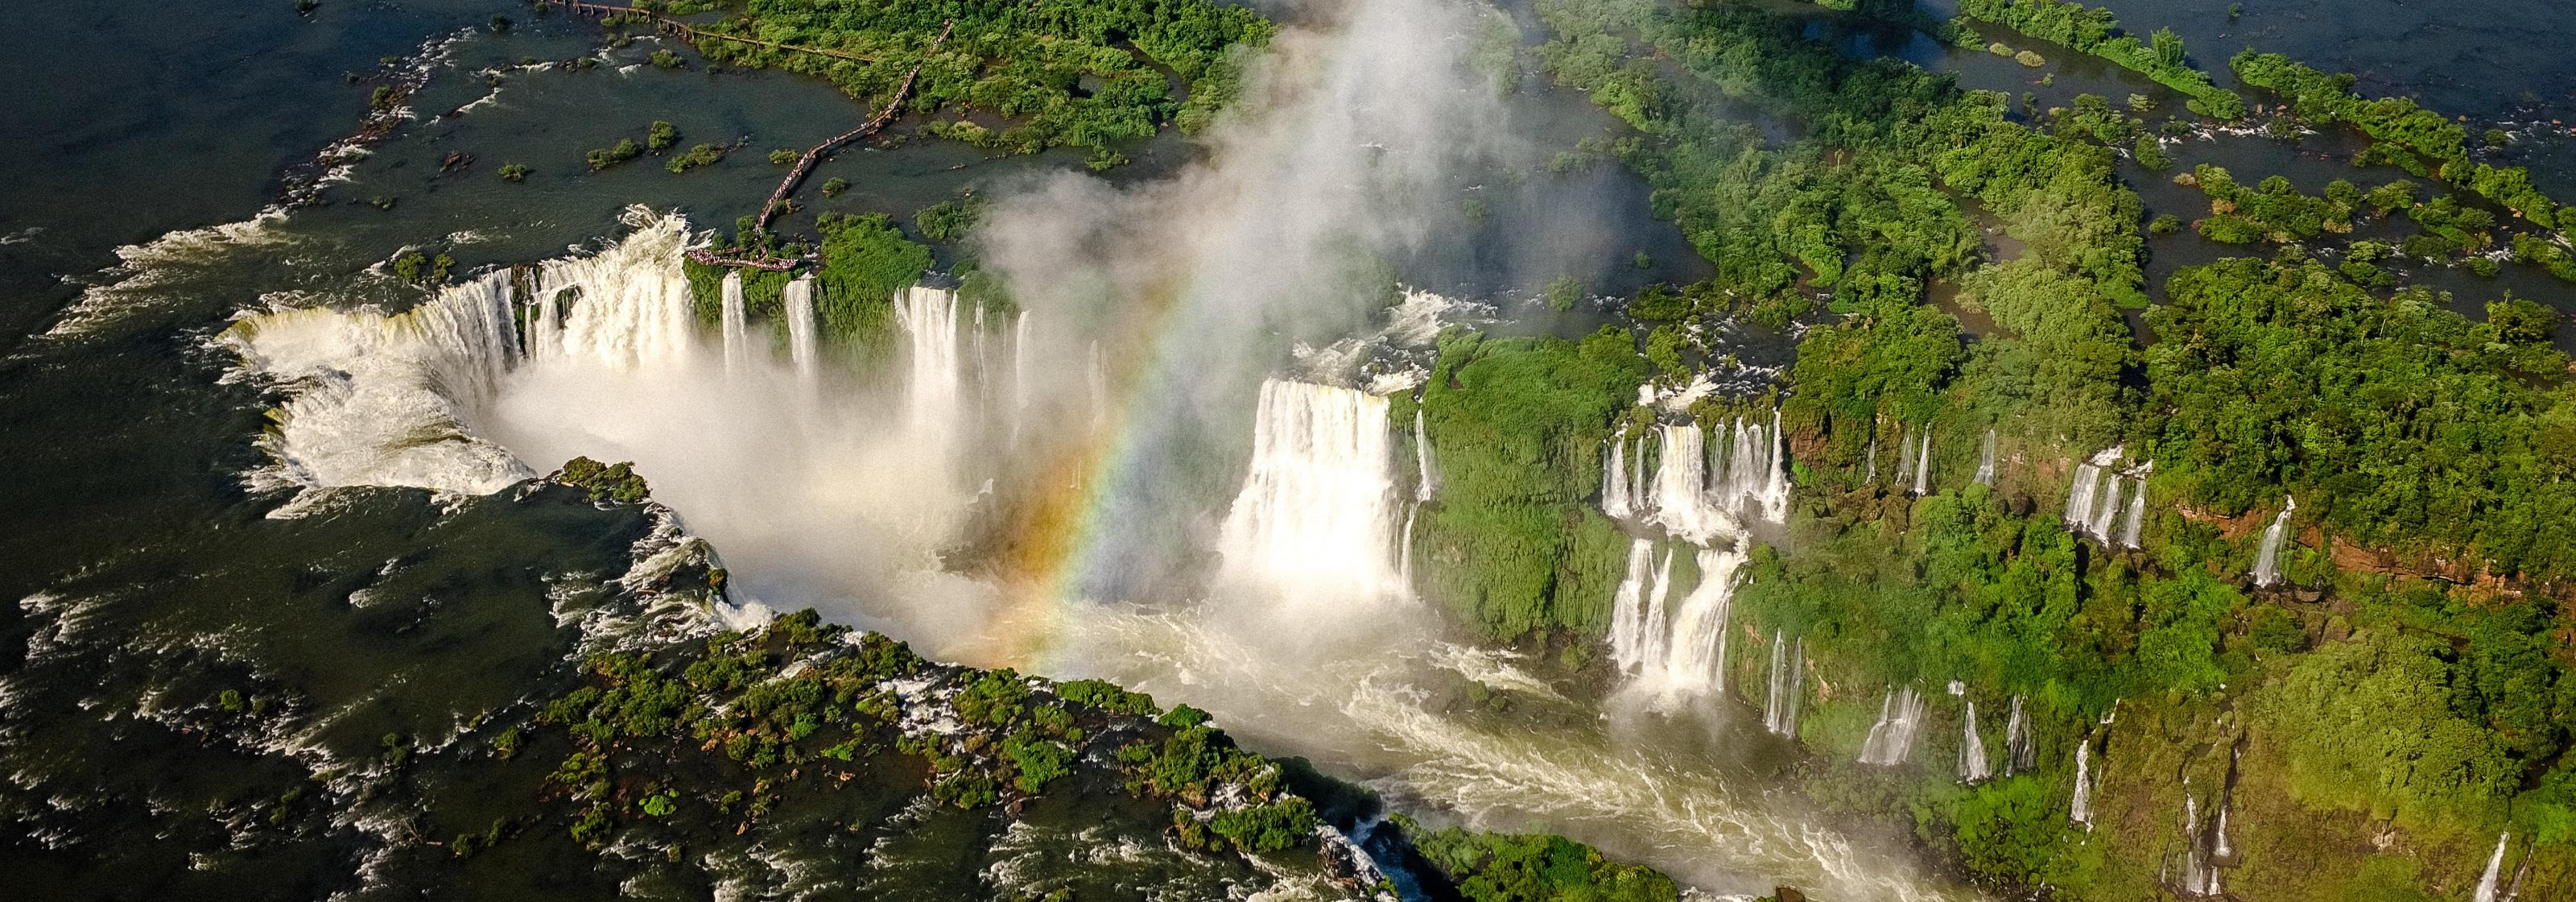 Cose da fare a Puerto Iguazu